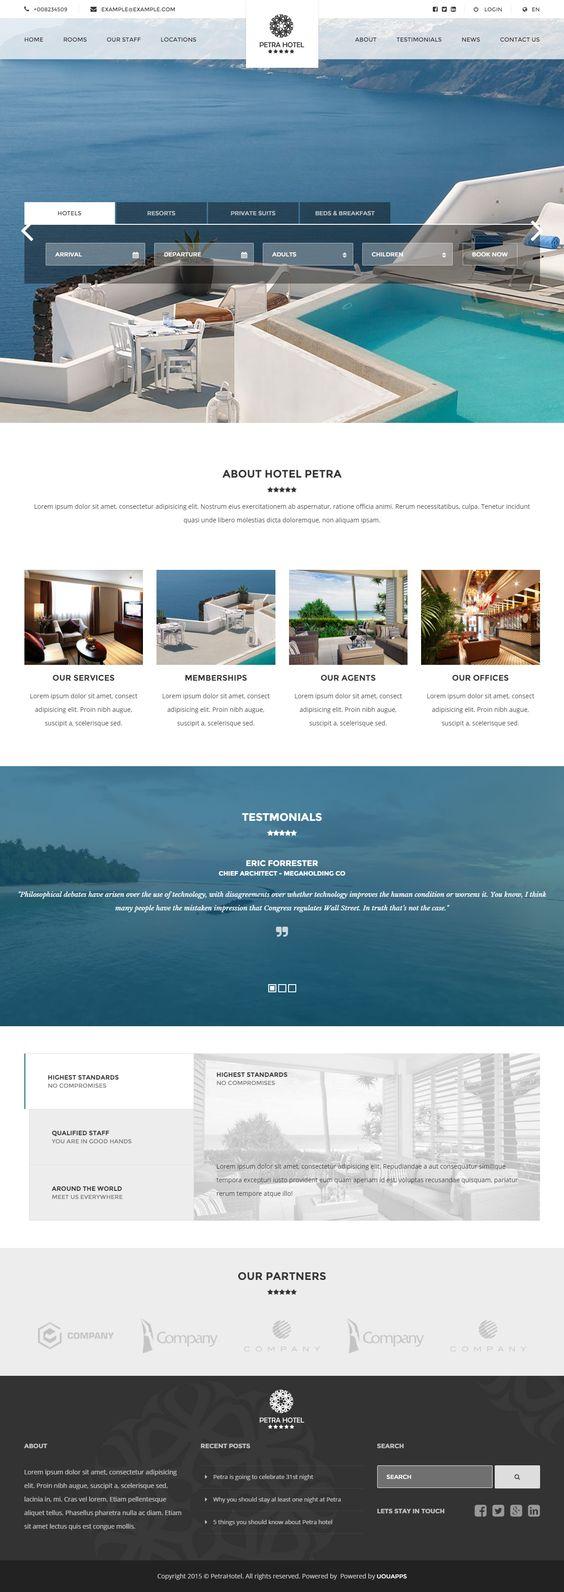 Google themes video - Petra Is Premium Full Responsive Wordpress Hotel Theme Retina Ready Angular Js Video Background Woocommerce Google Map Test Free Demo At